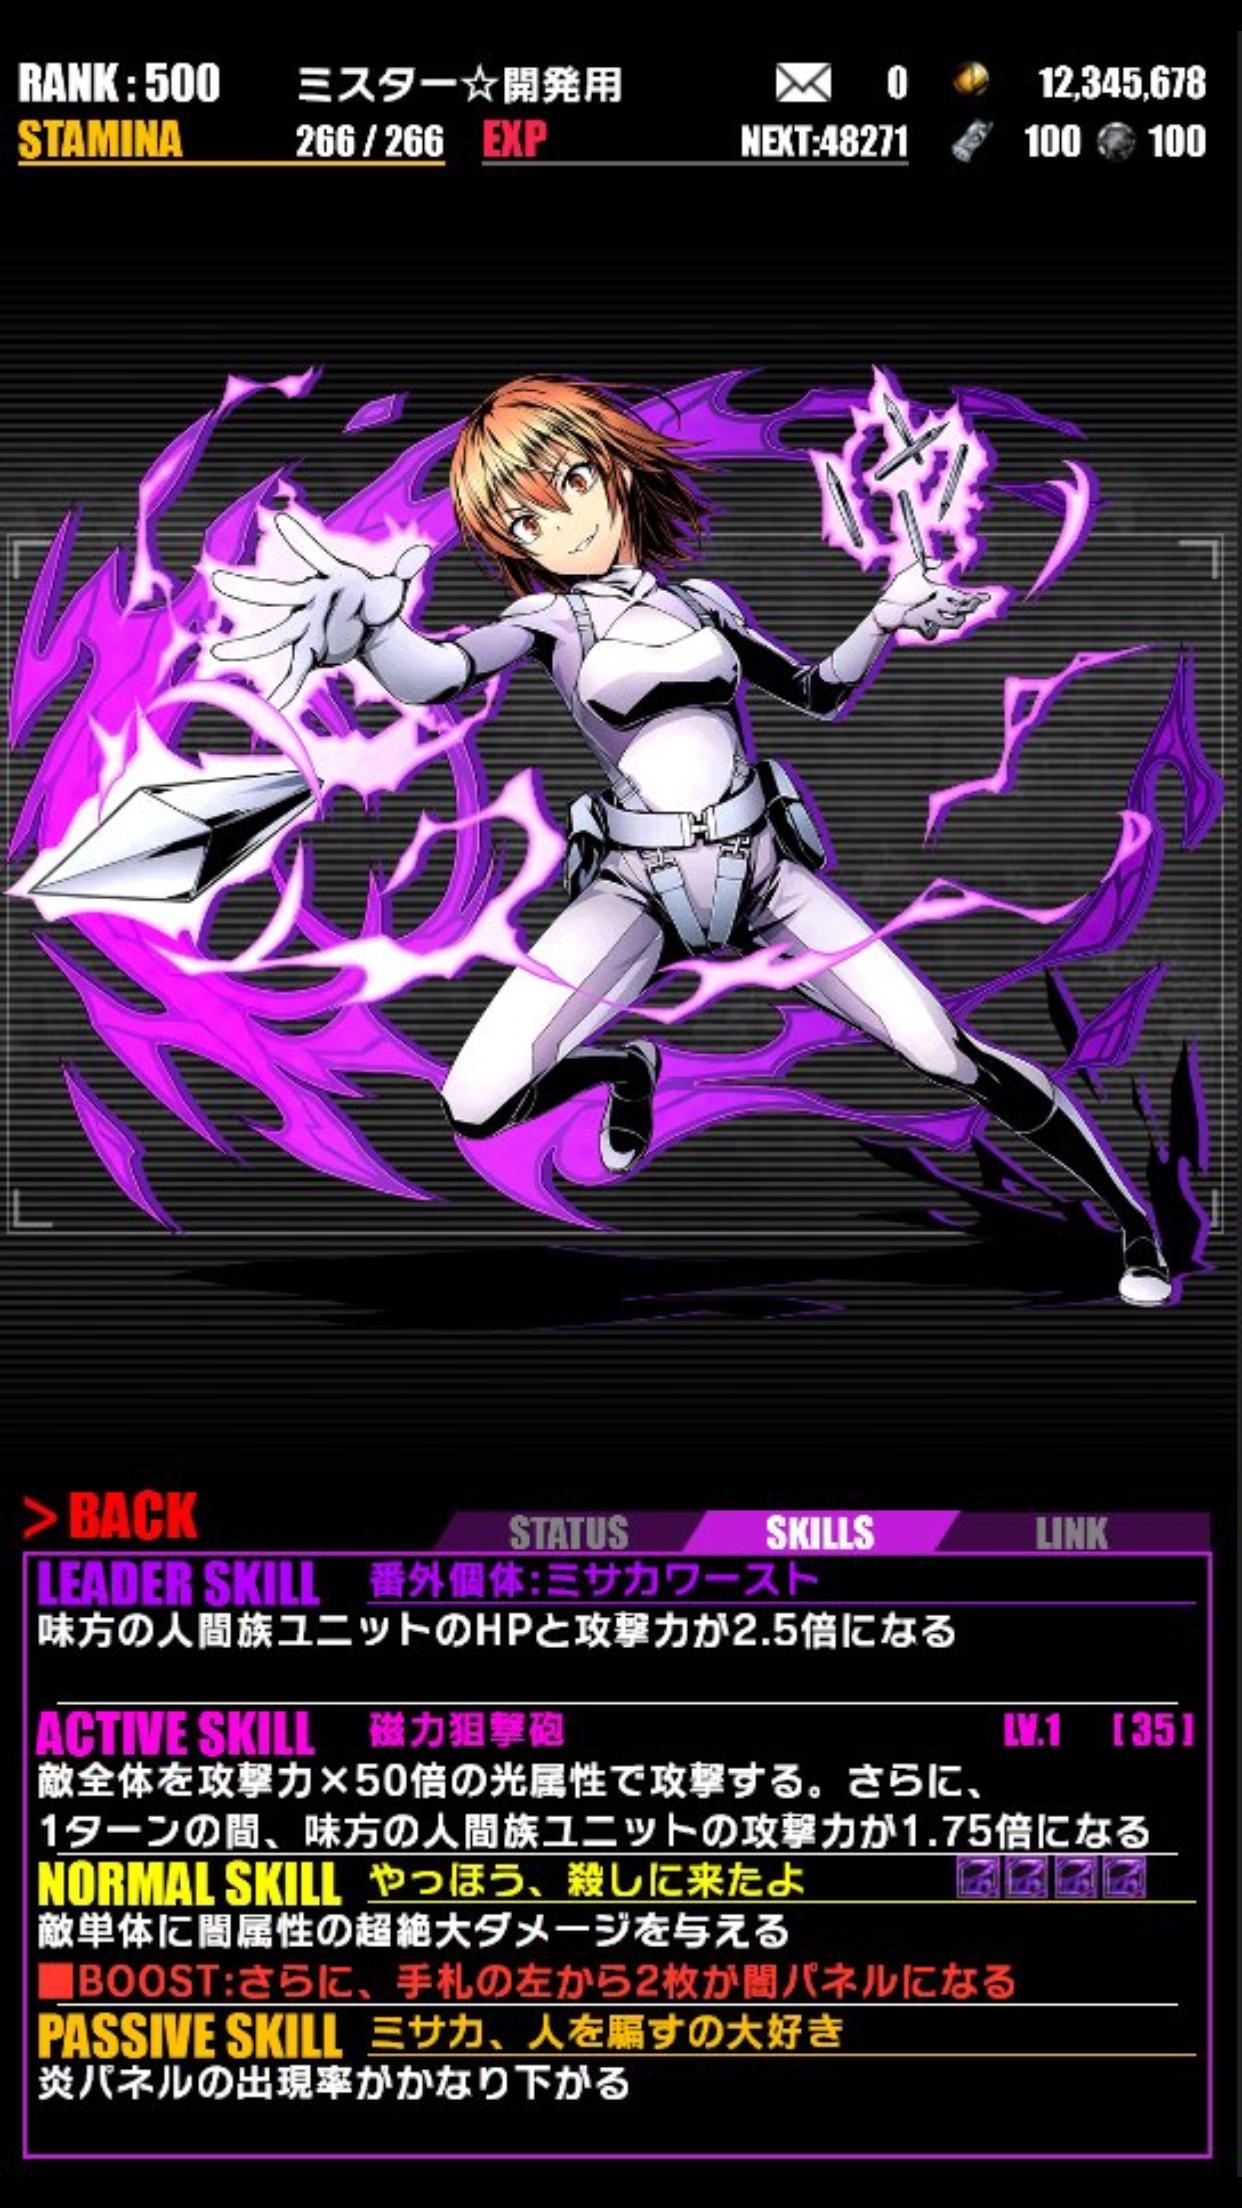 f:id:takumahakusyaku46:20170113000959p:image